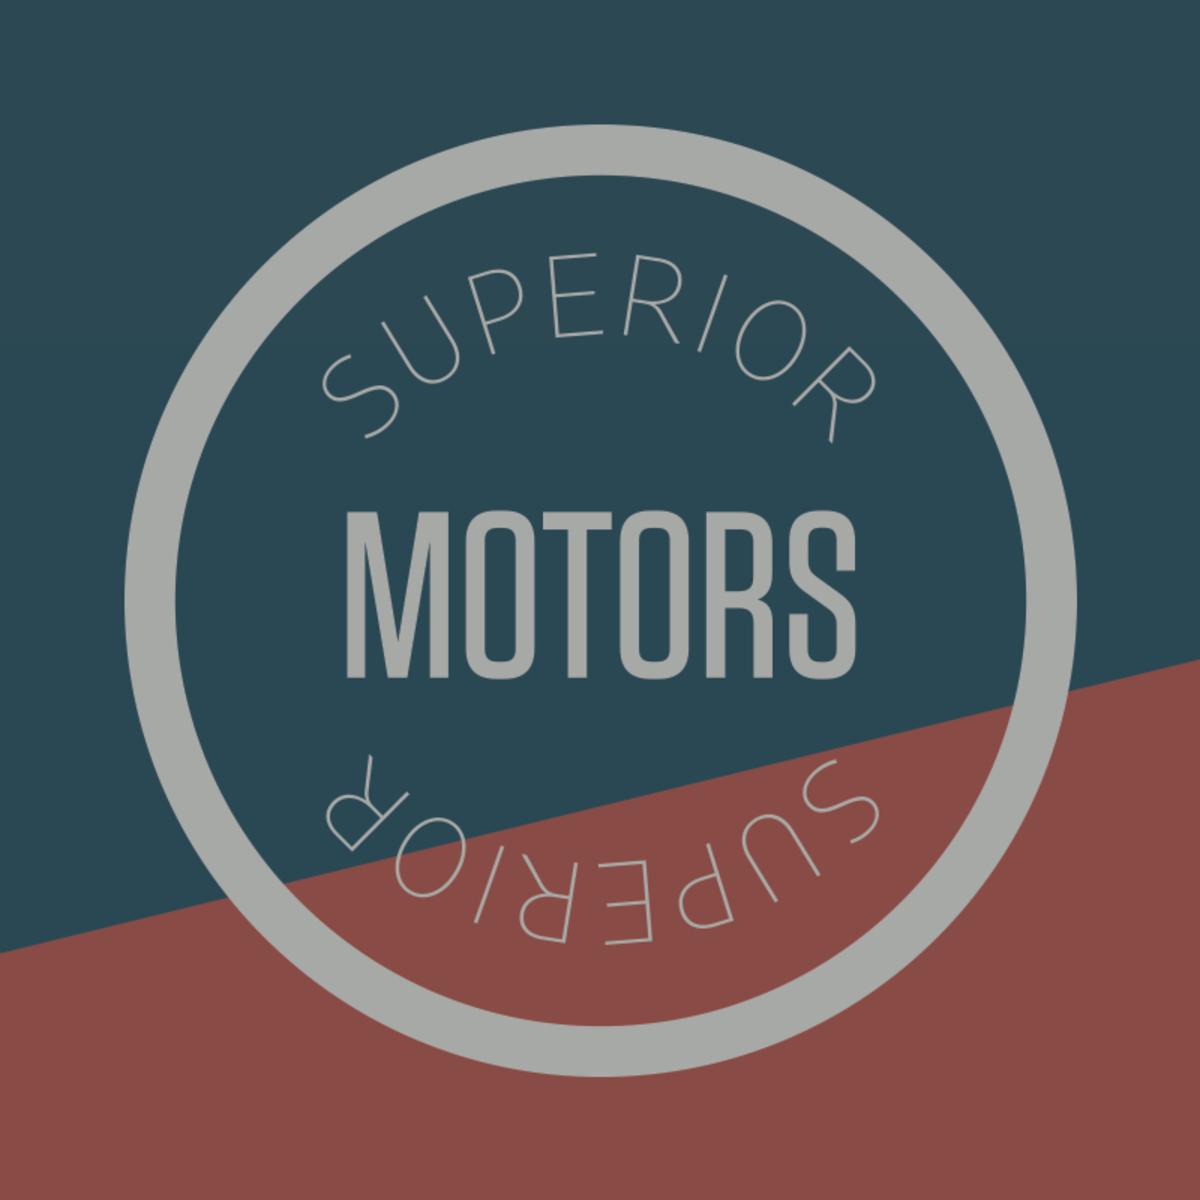 Superior Motors Menu >> Auction Page Superior Motors